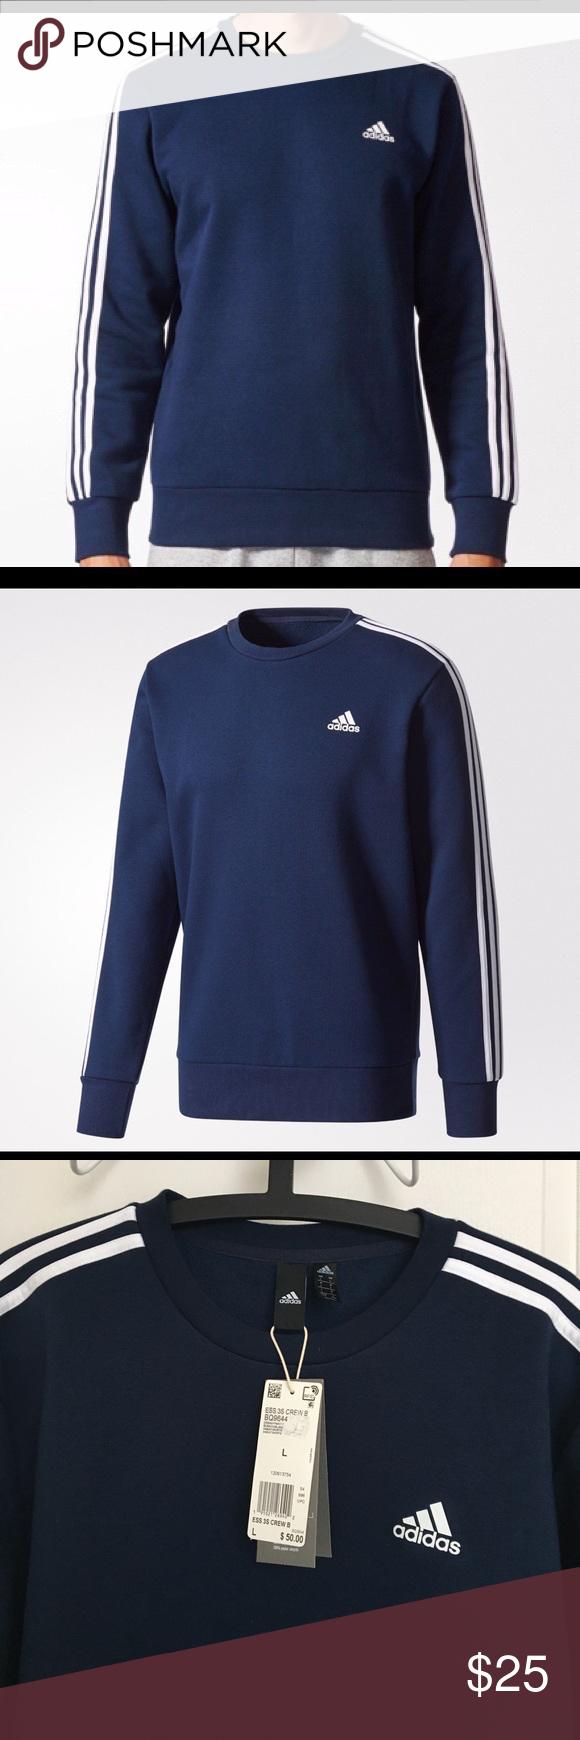 Men S Adidas 3 Stripes Sweatshirt Navy L Striped Sweatshirts Adidas Men Long Sleeve Tshirt Men [ 1740 x 580 Pixel ]